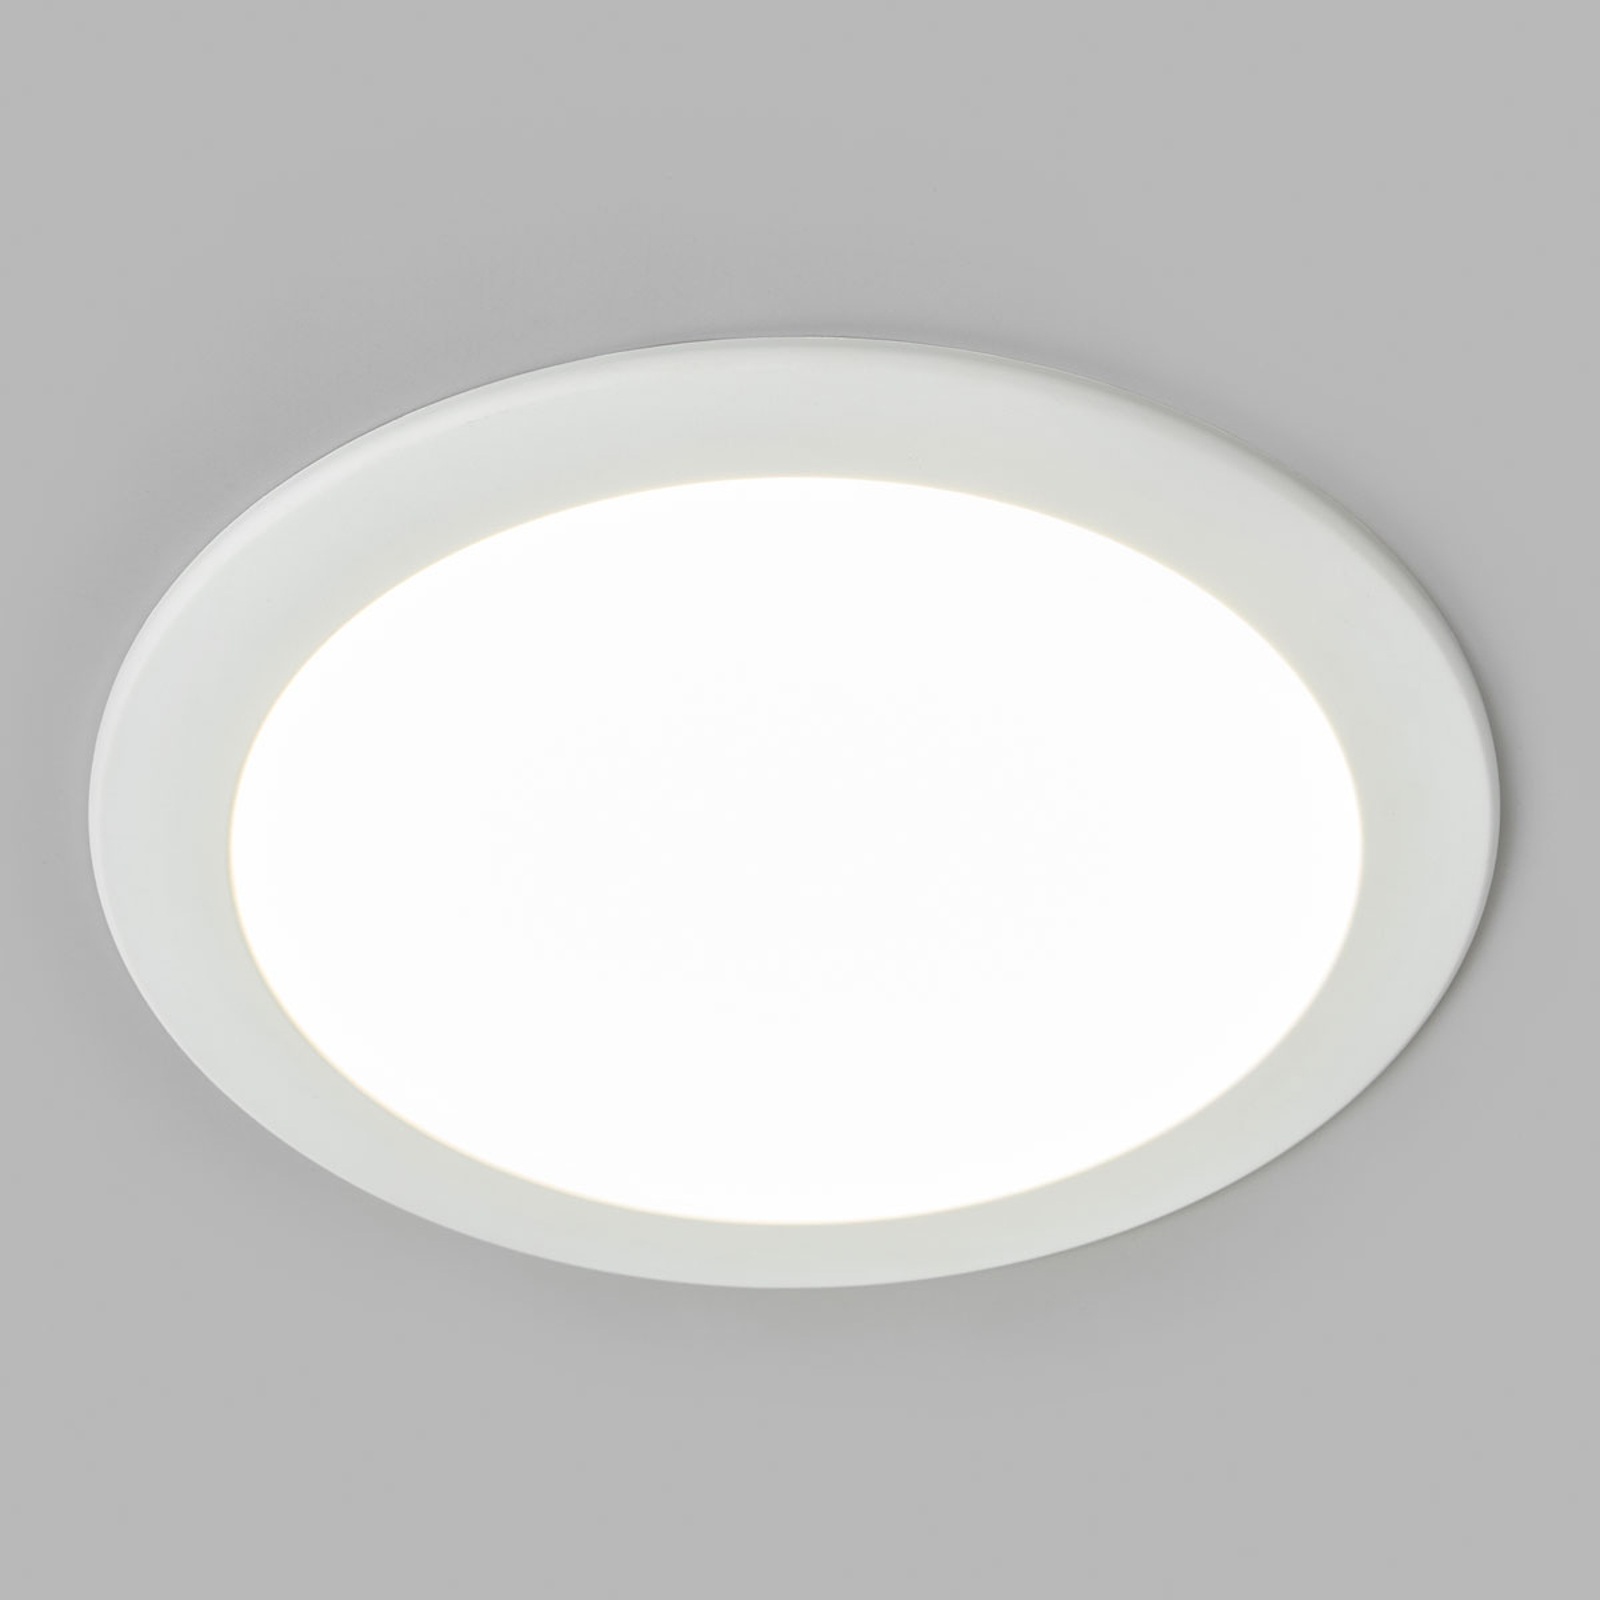 LED-indbygningsspot Joki hvid 4000K rund 24cm